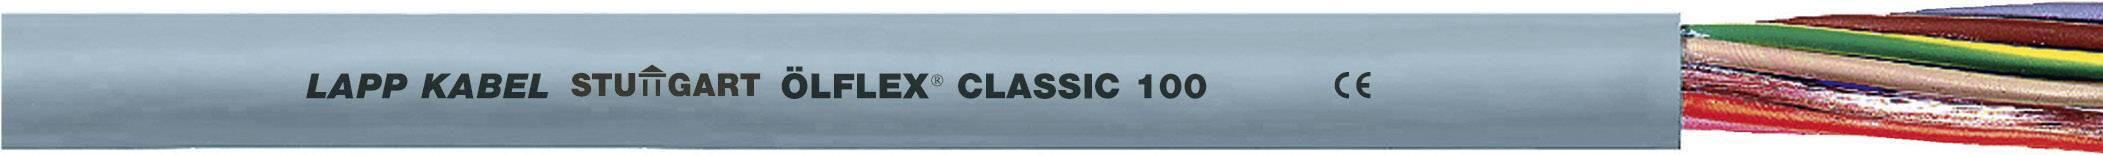 Kabel LappKabel Ölflex CLASSIC 100 7G1,5 (0010068), PVC, 8,9 mm, 500 V, šedá, 1000 m